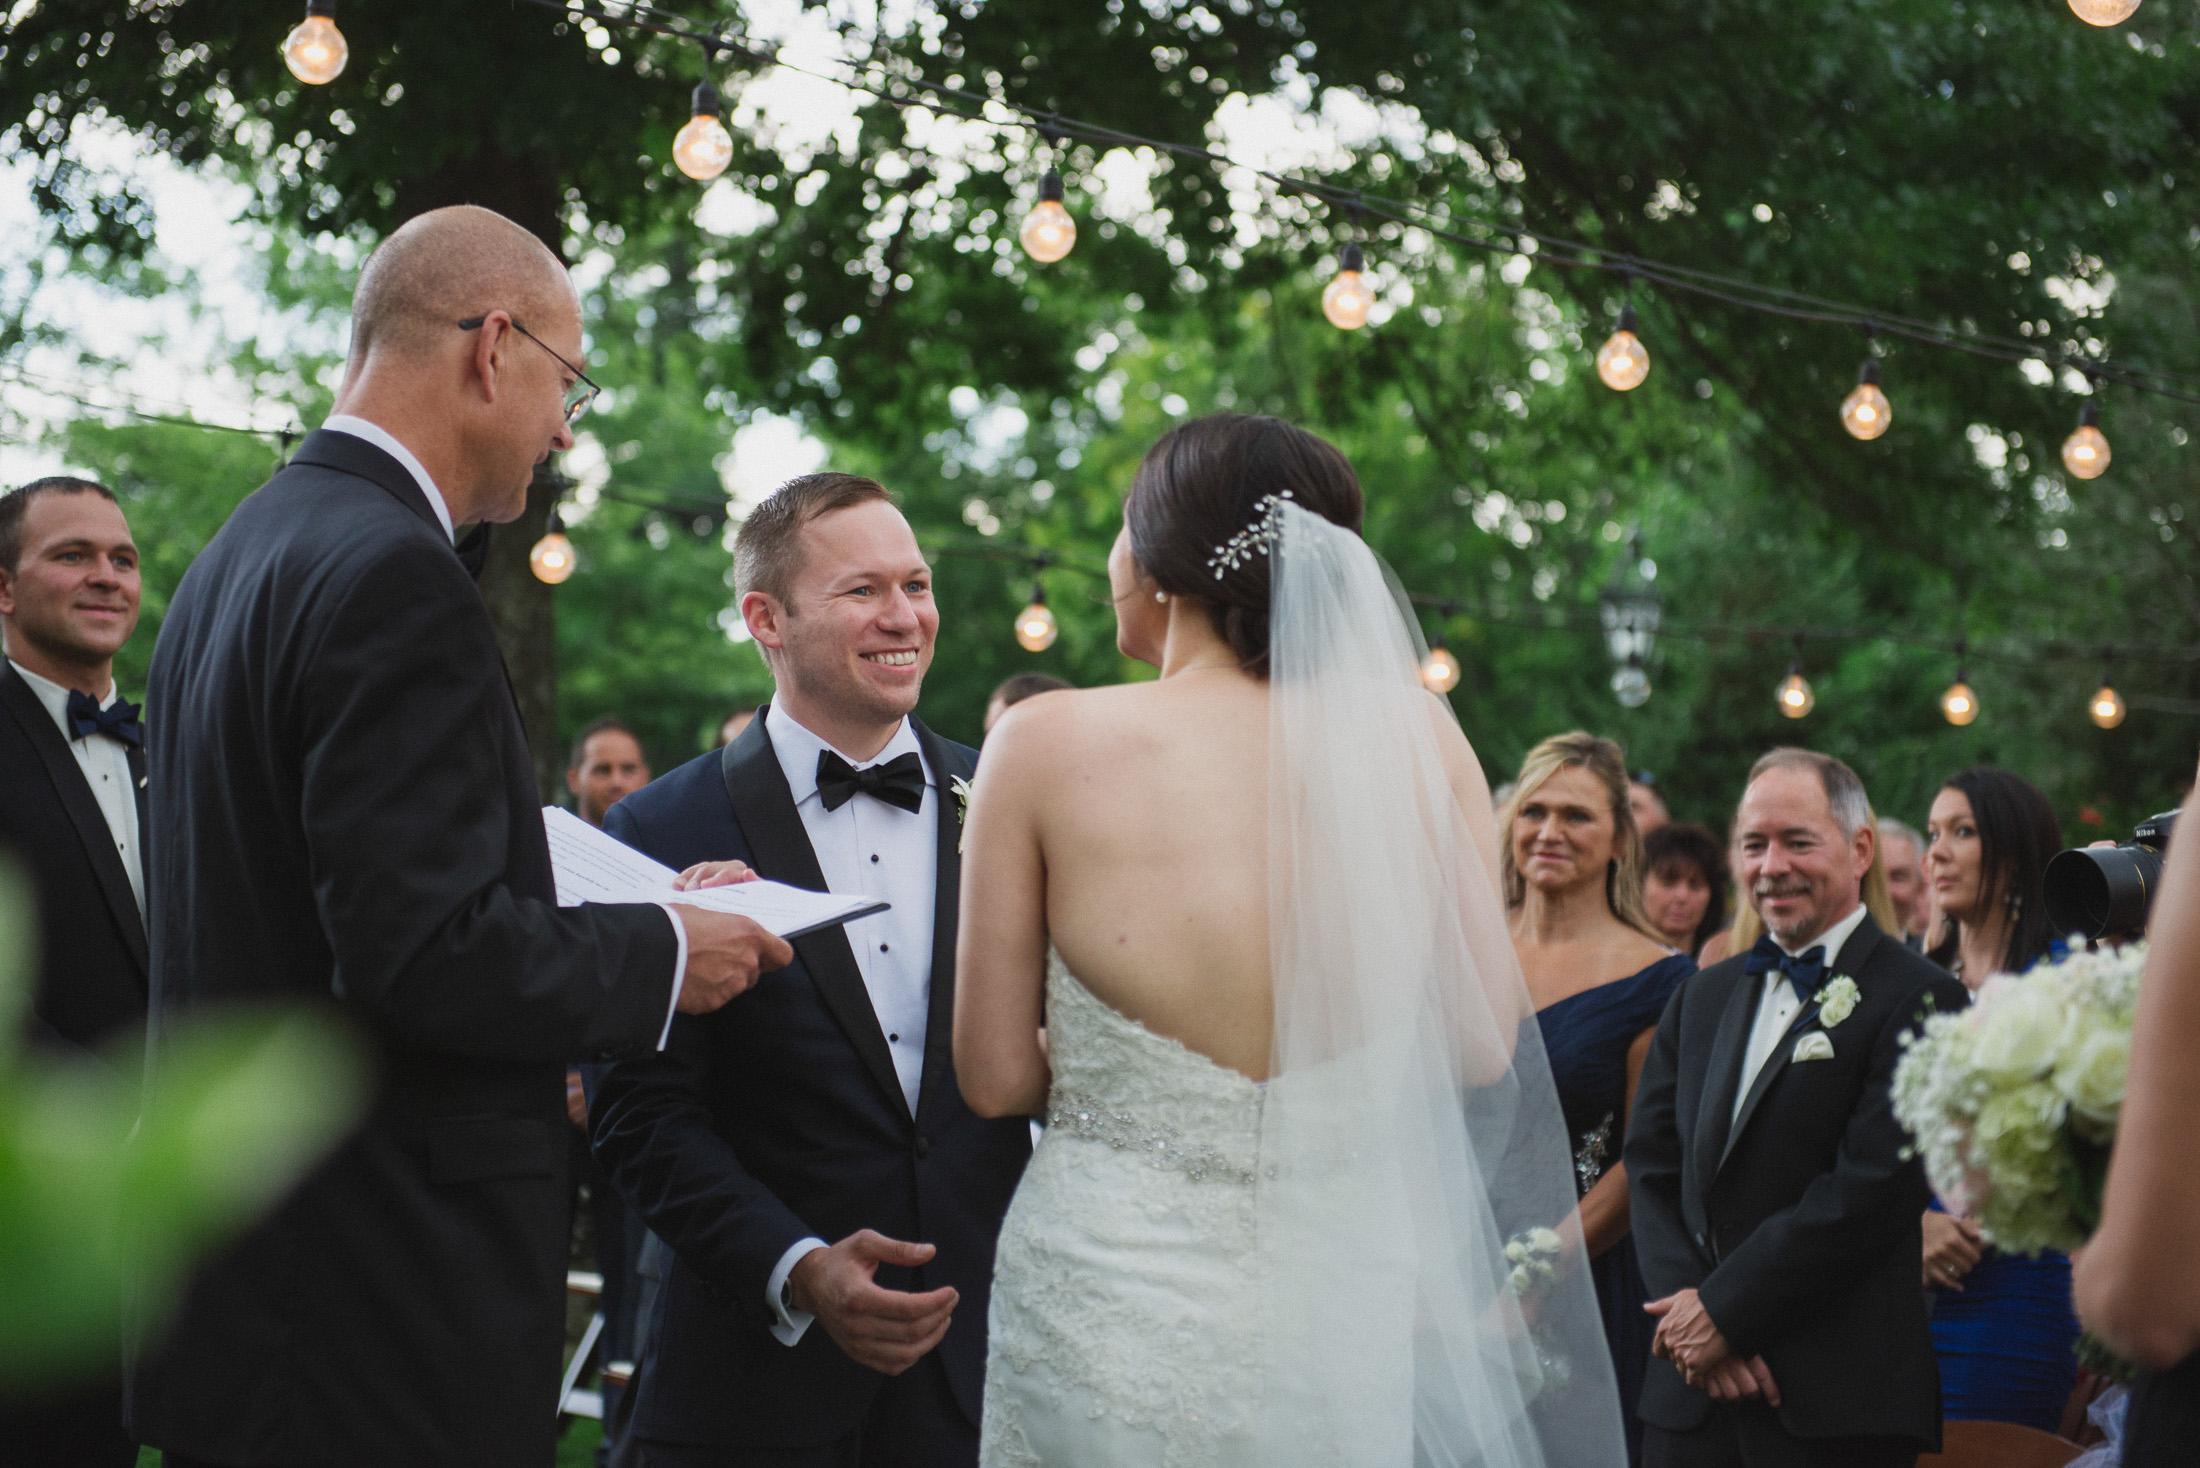 NH Wedding Photographer: ceremony at BVI